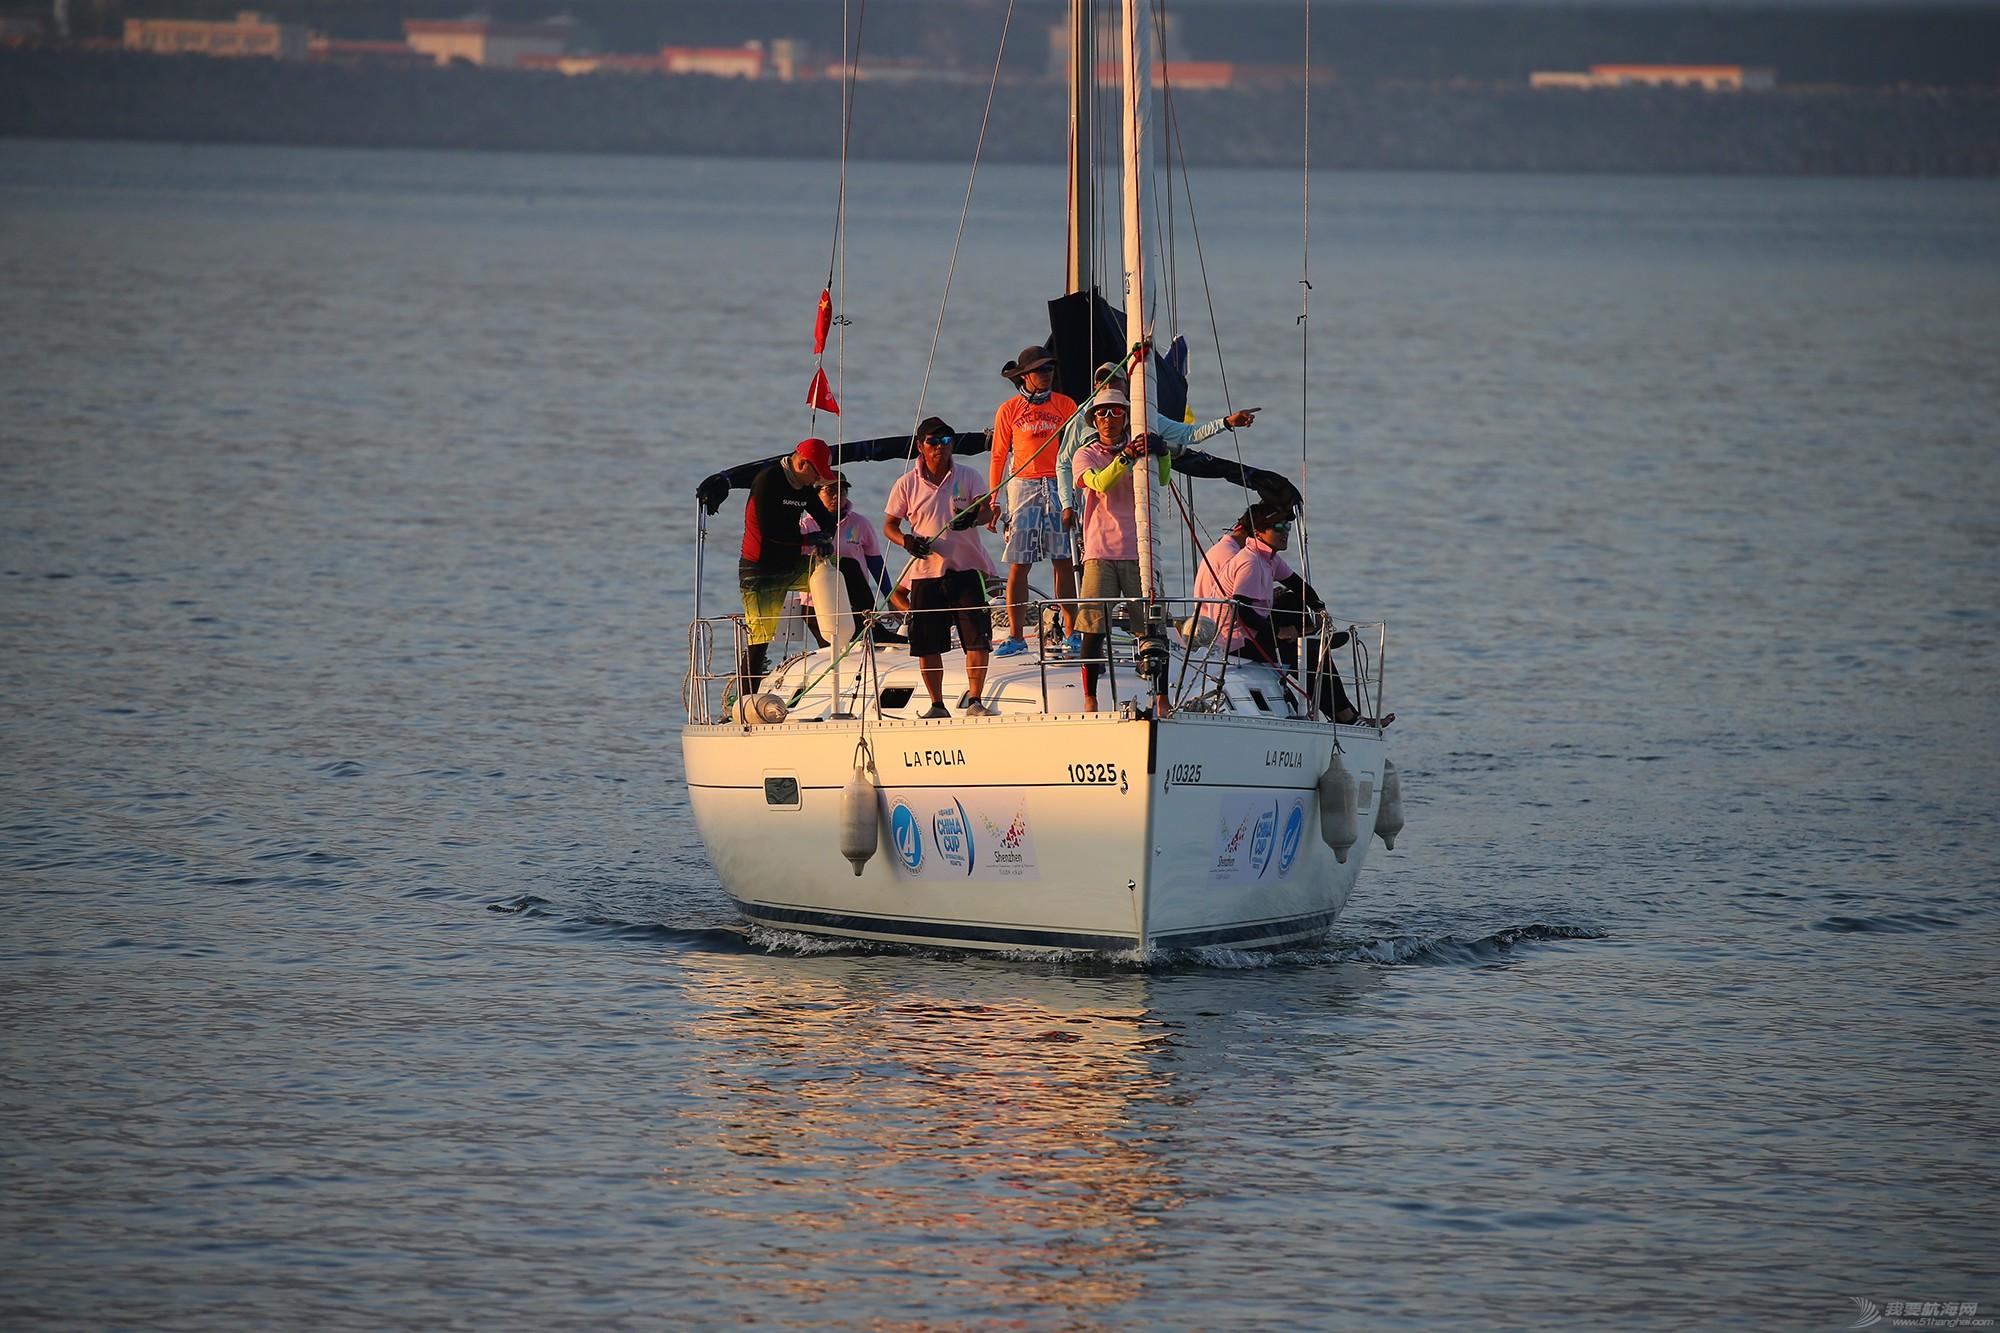 Insurance,菲律宾,辛普森,拉力赛,Black,Insurance 中国杯帆船赛首日,辛普森深港拉力赛波澜不惊 E78W3930.JPG